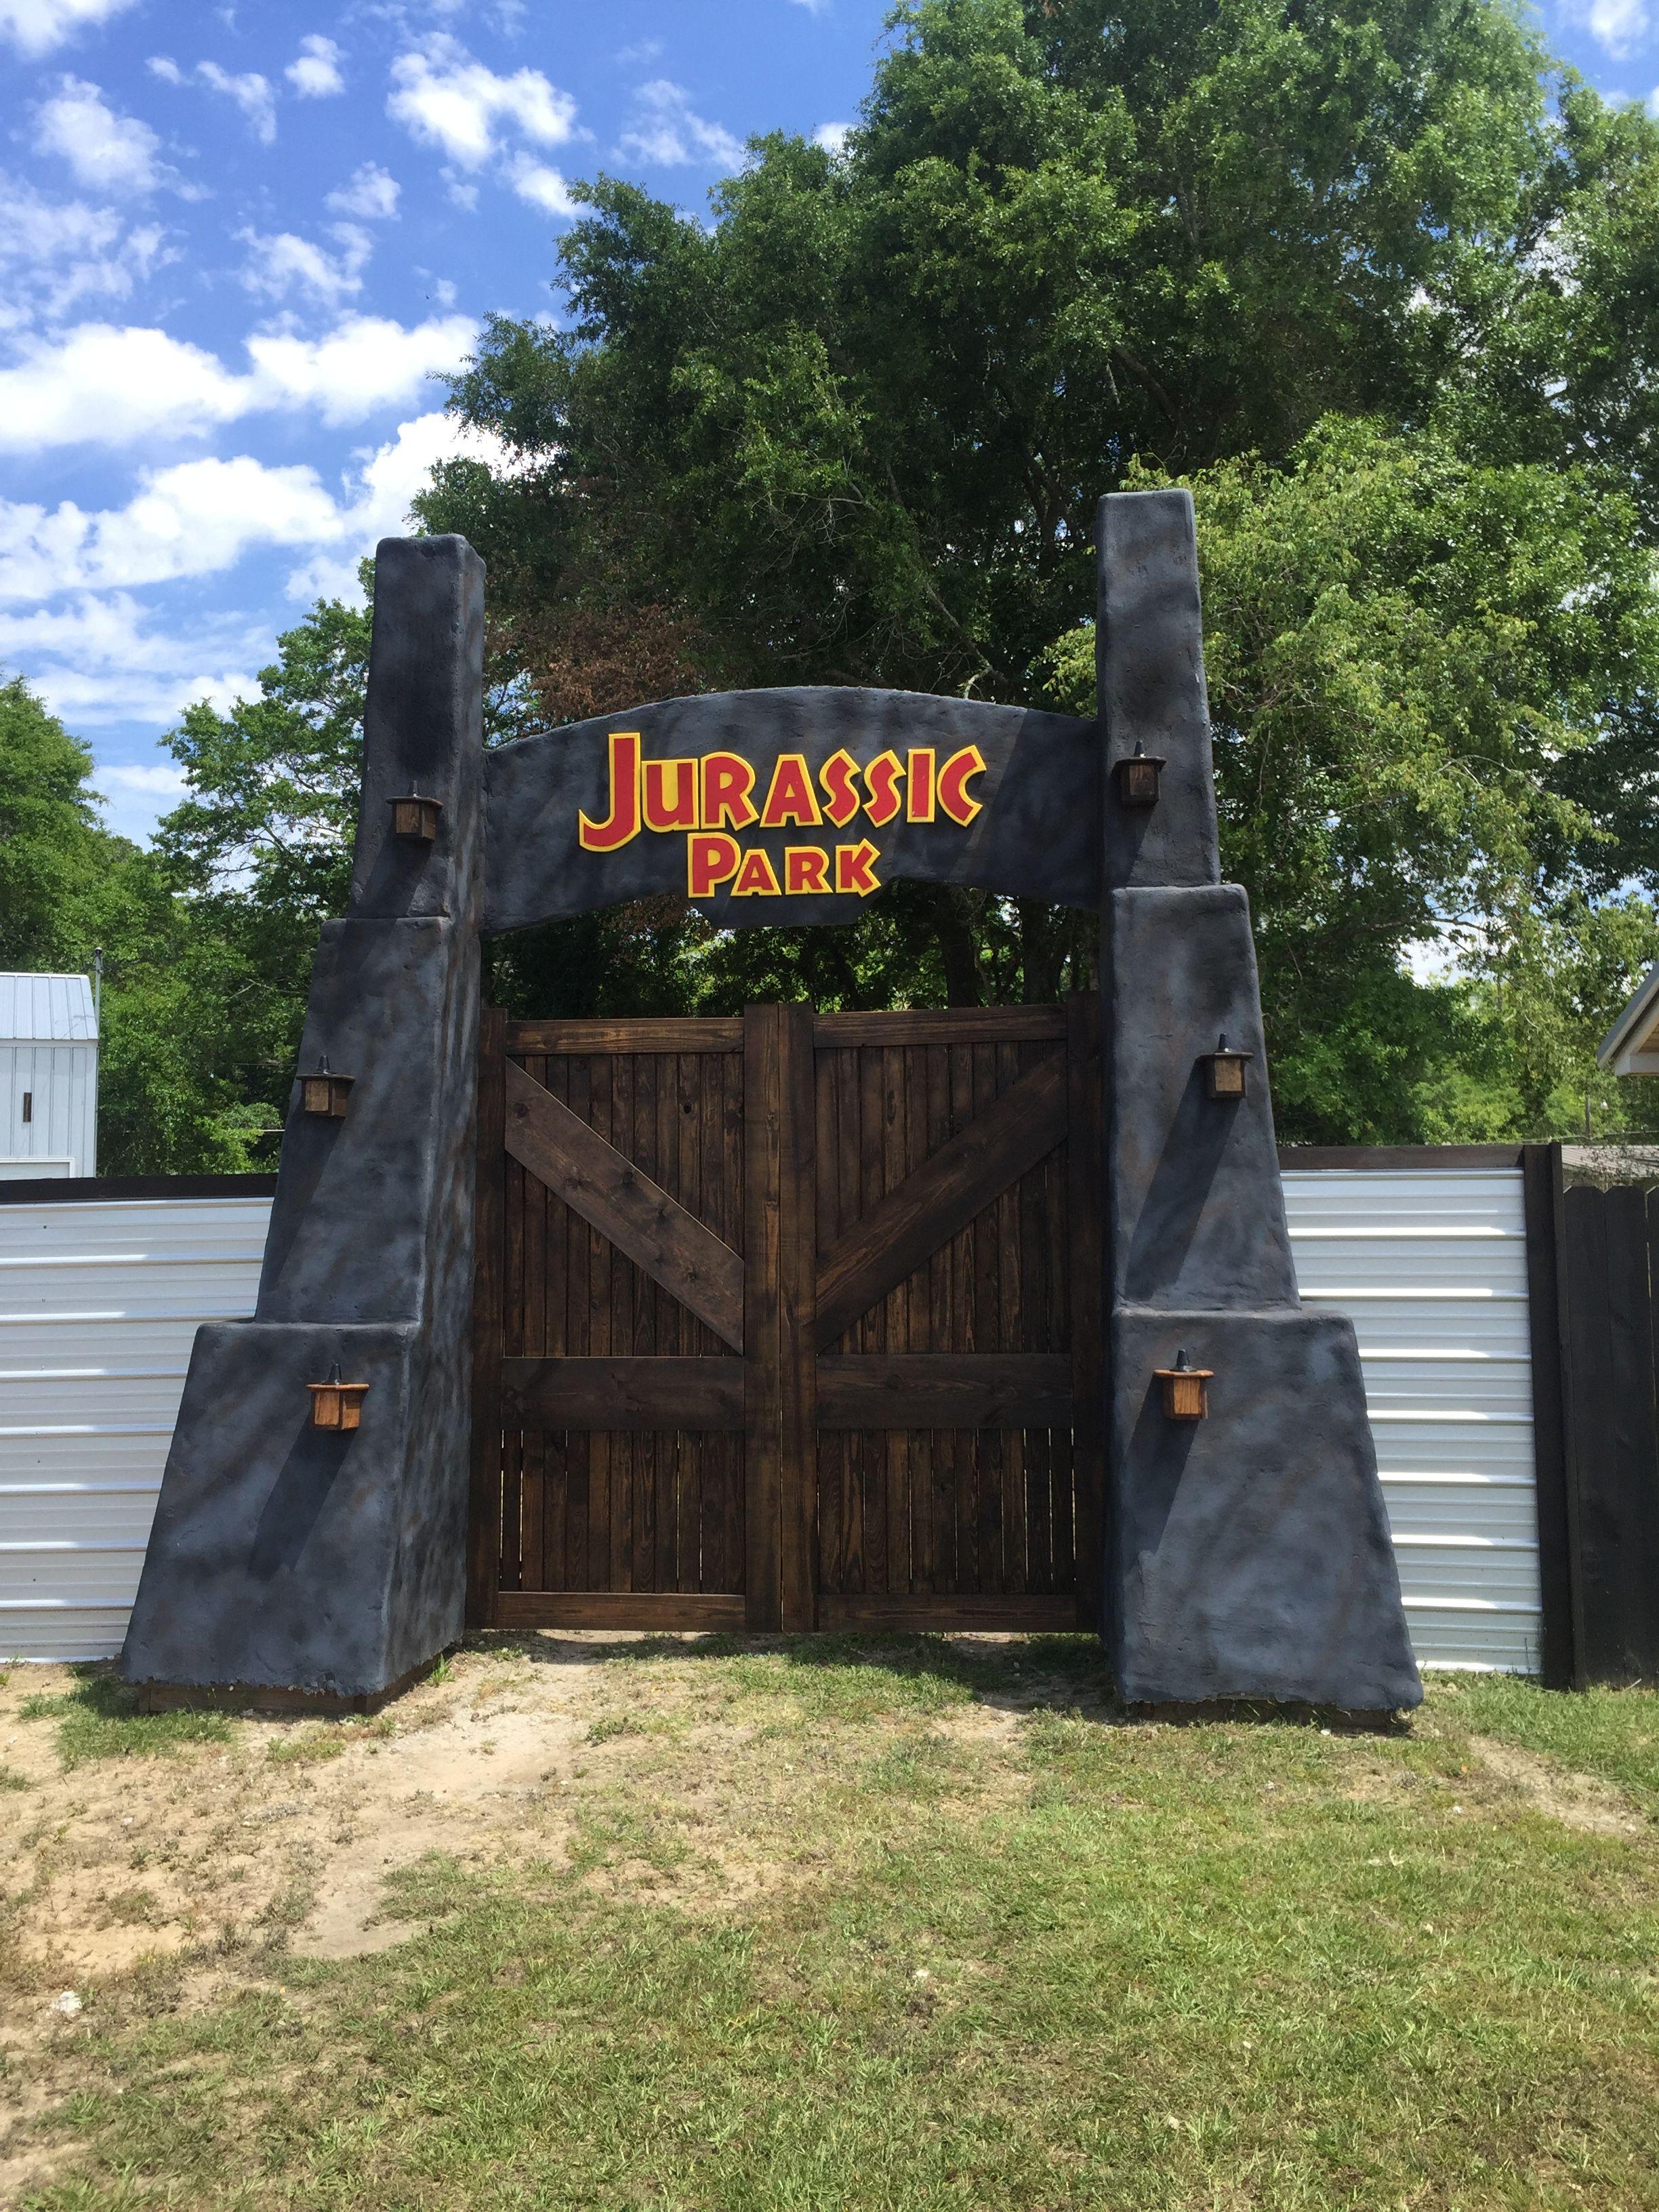 Homemade jurassic park gate made by Joshua Perez  Jurassic park